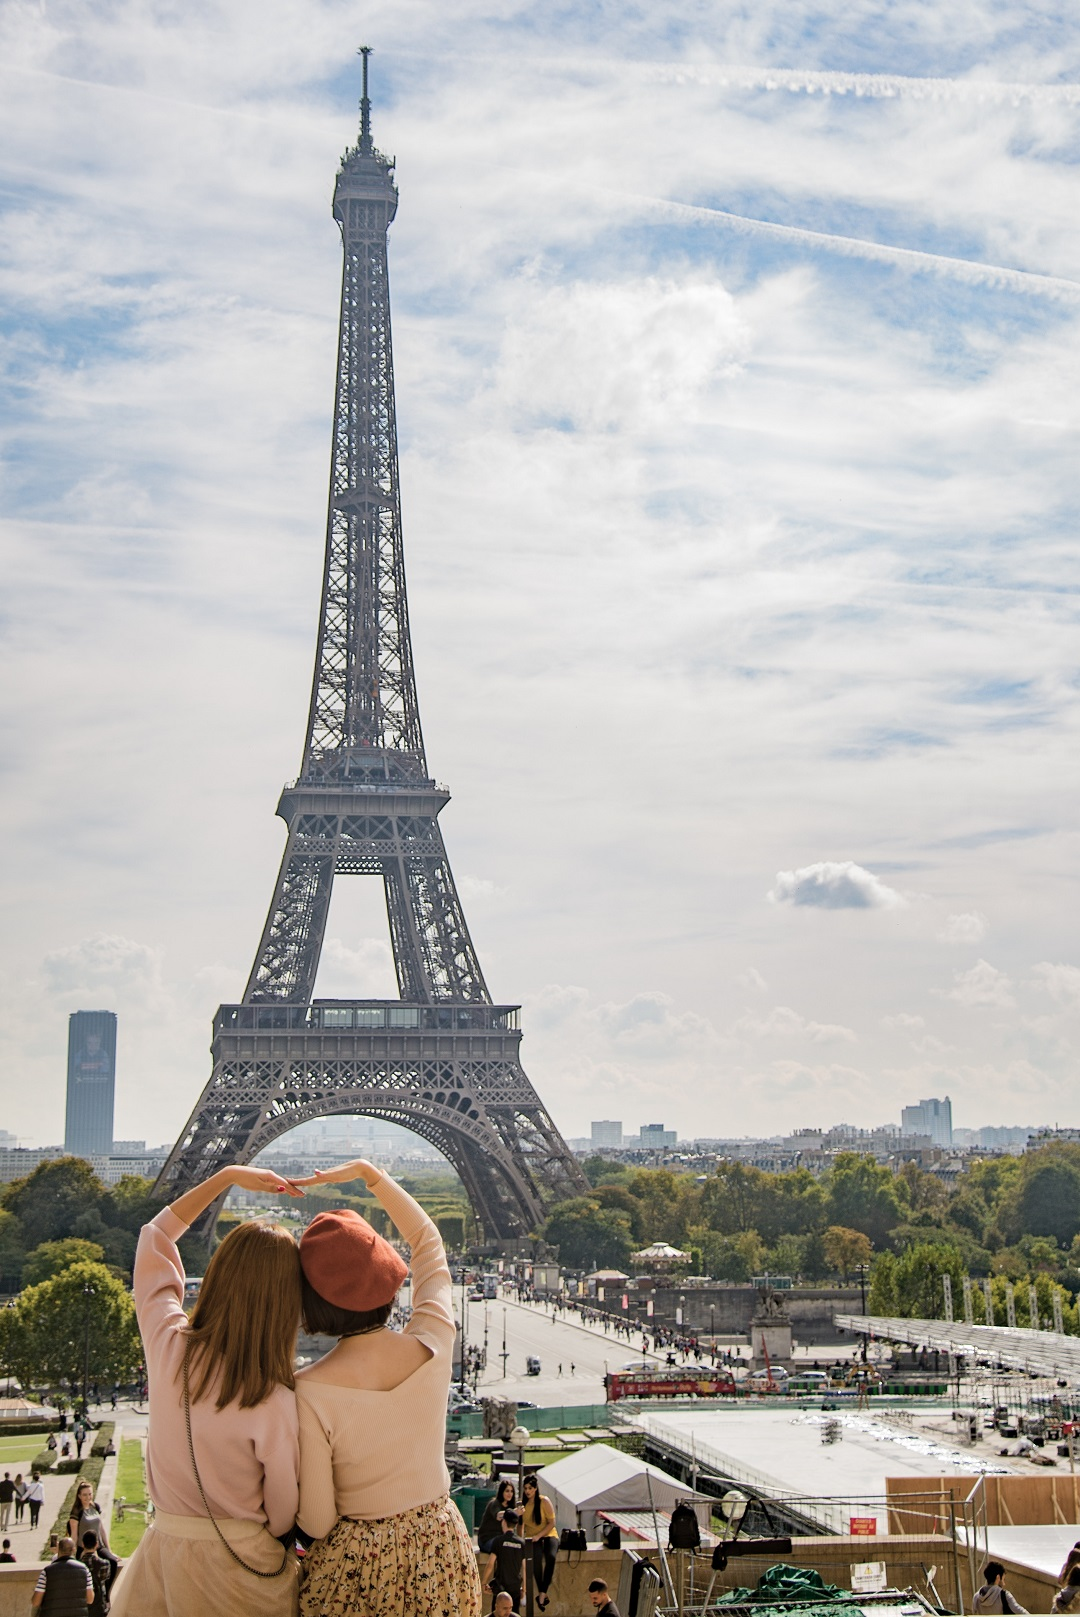 Obnovljen Eiffelov toranj - KIGO.hr